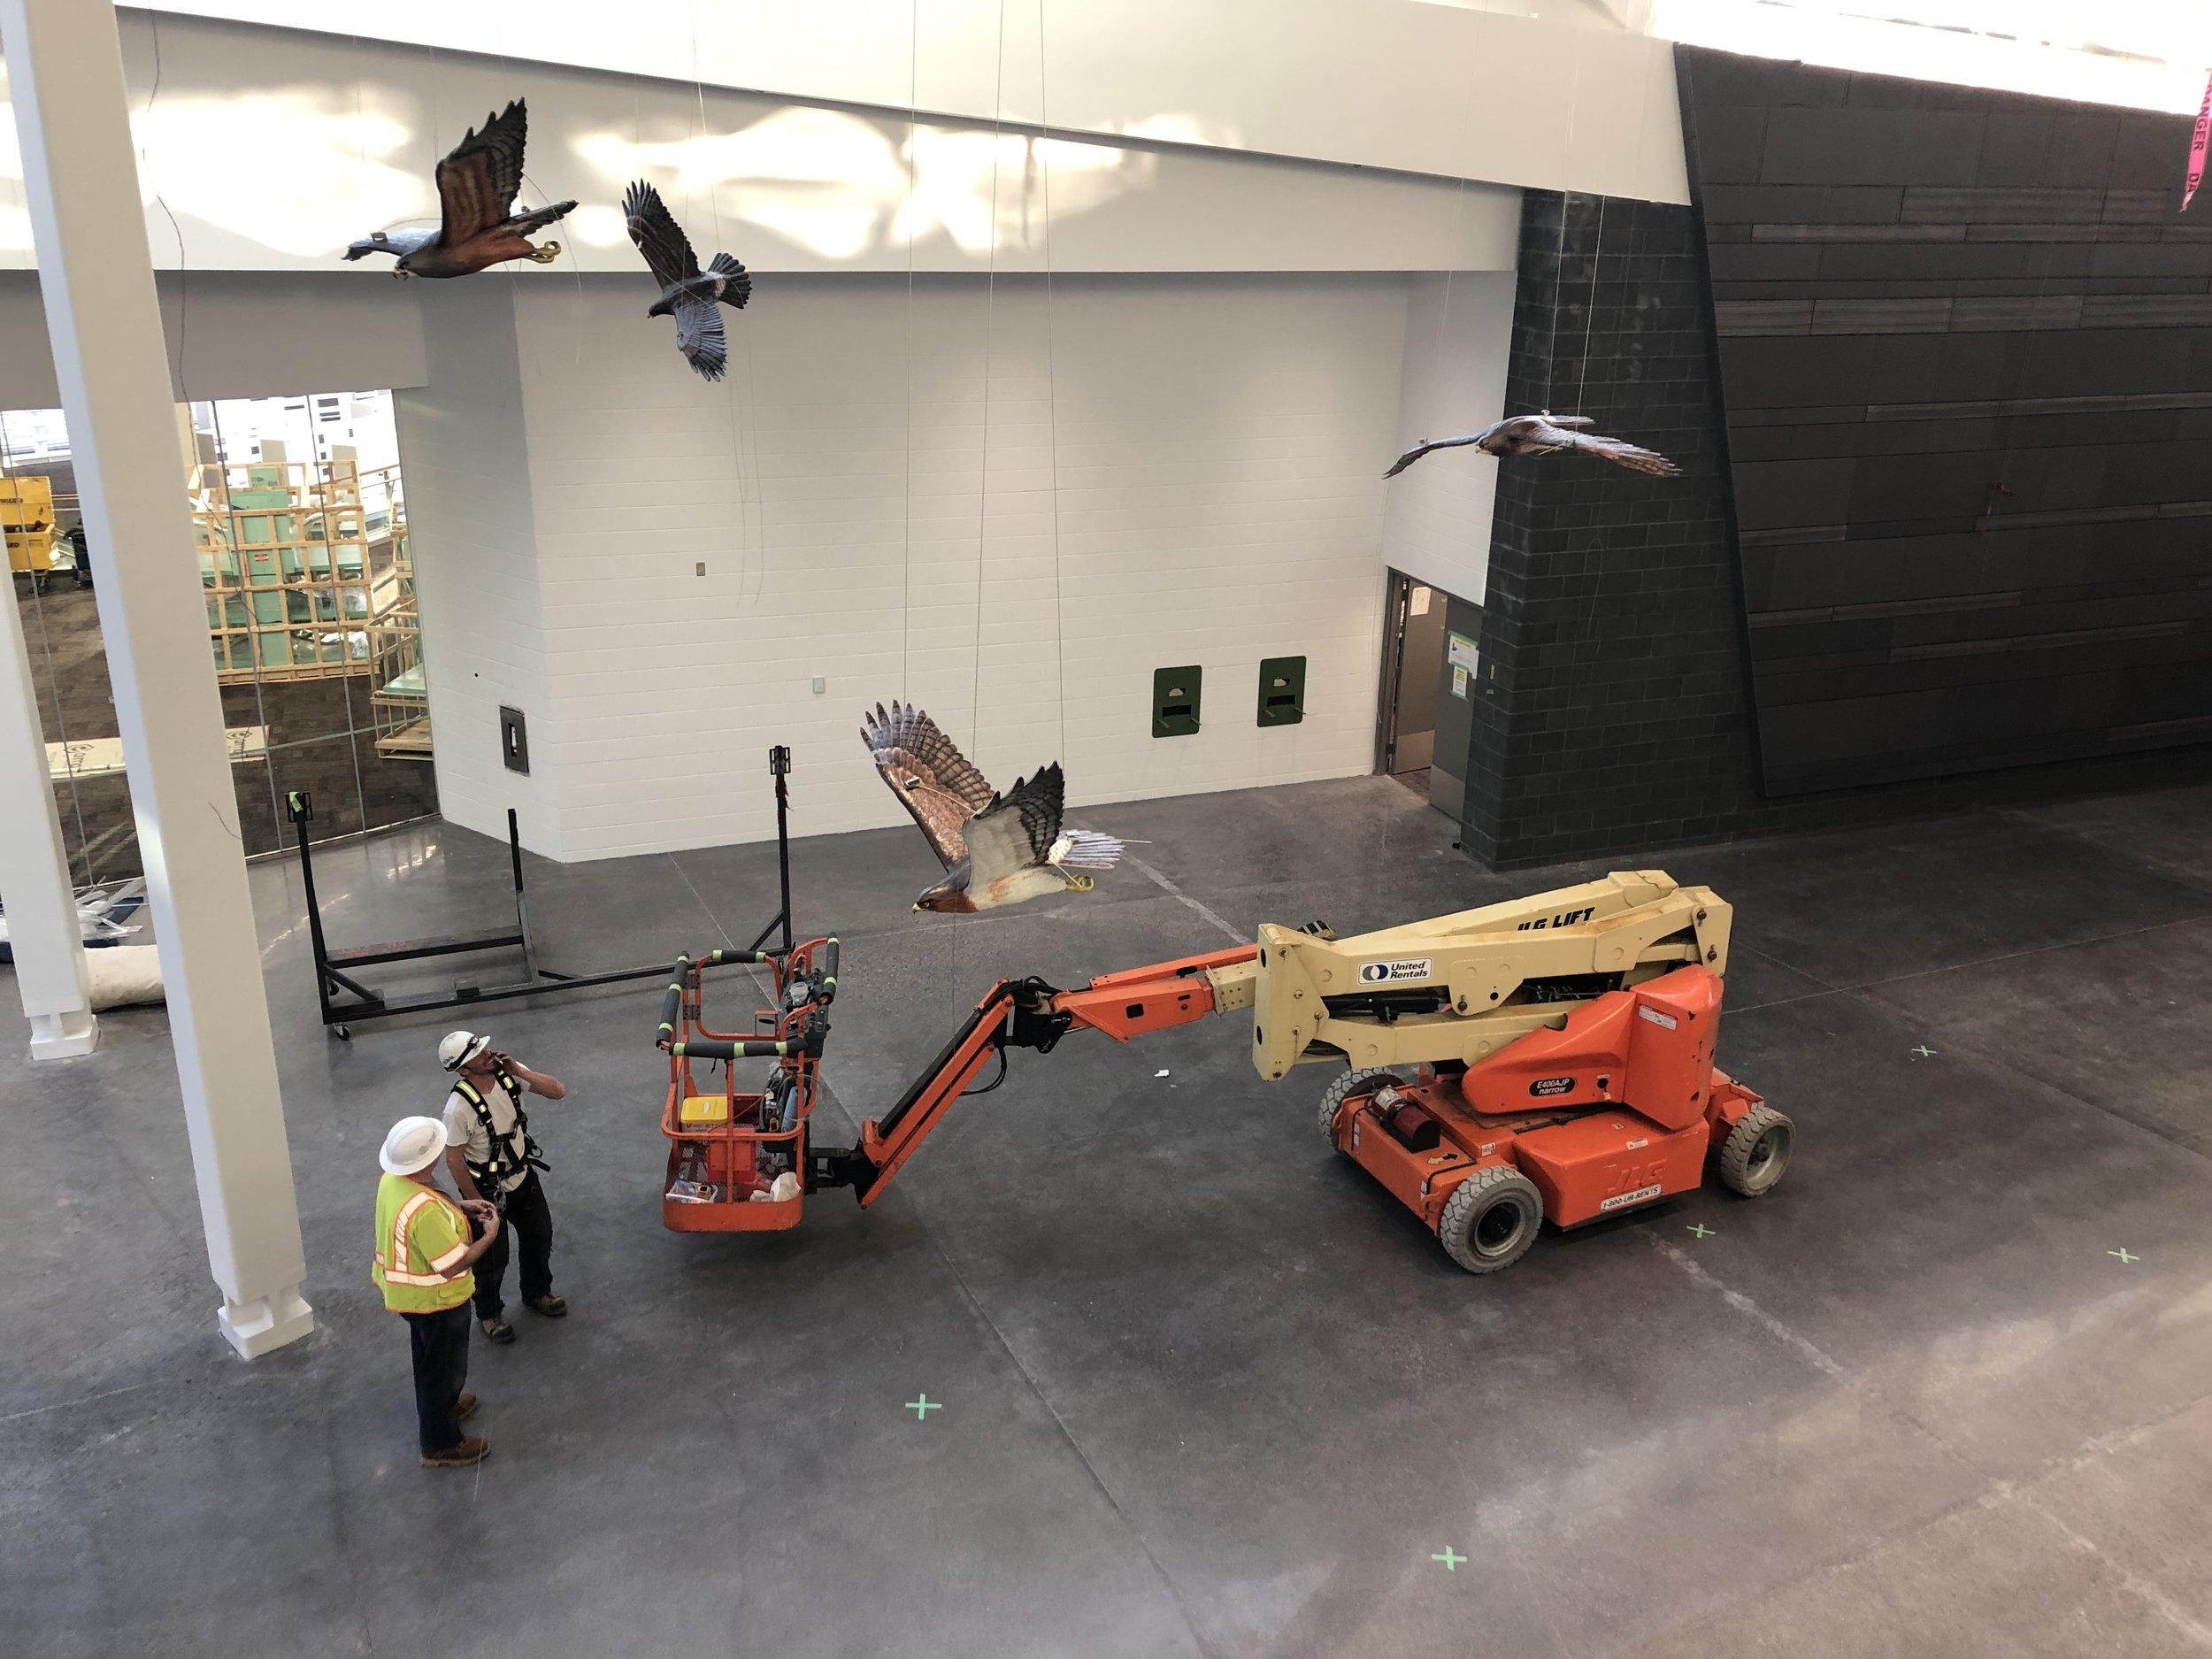 Calgary_The Nest_Donald Lipski_Public Art Services_J Grant Projects_31.jpg